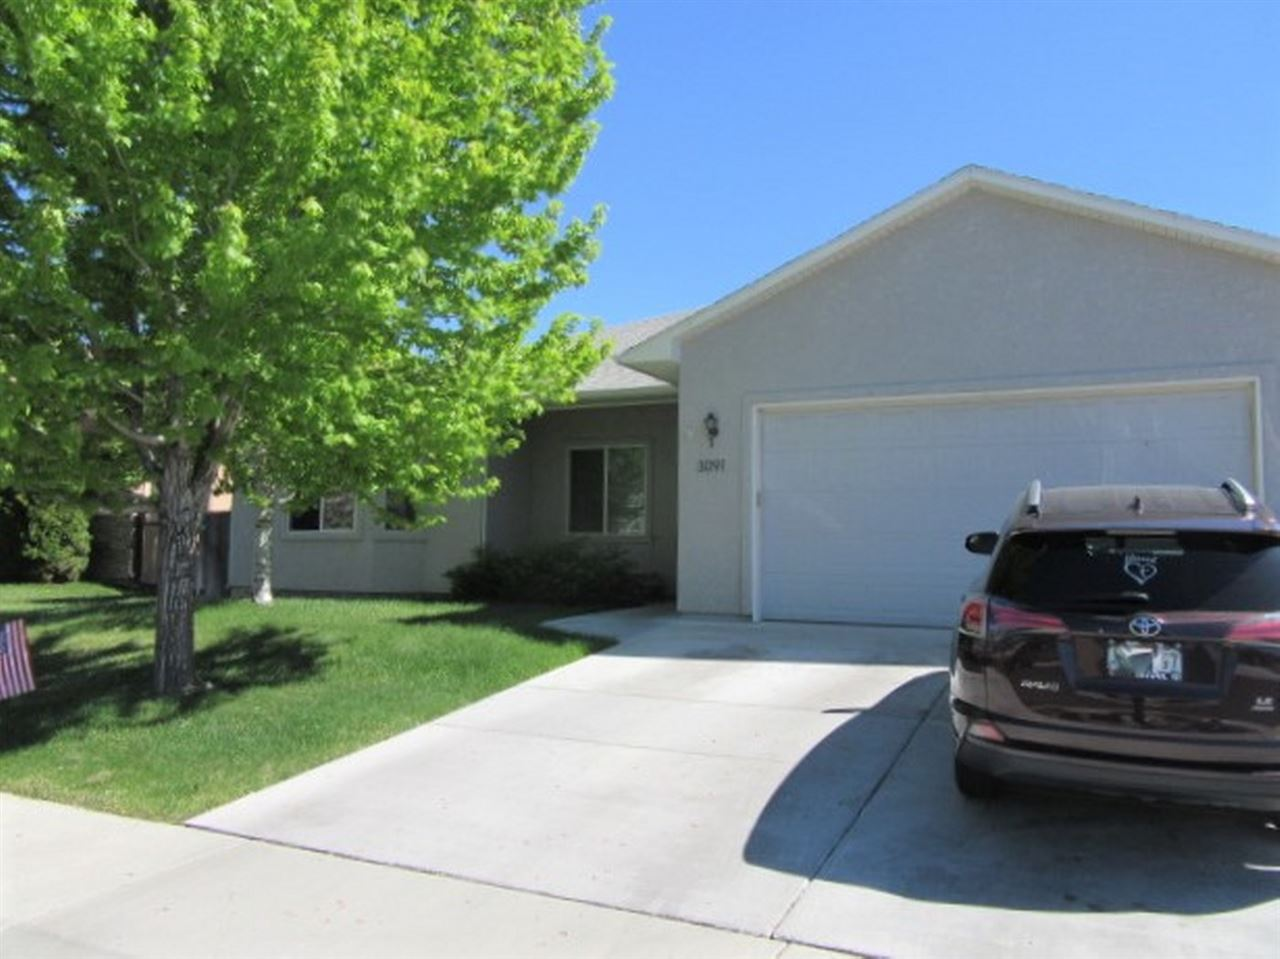 3091 Aberdeen Lane, Grand Junction, CO 81504